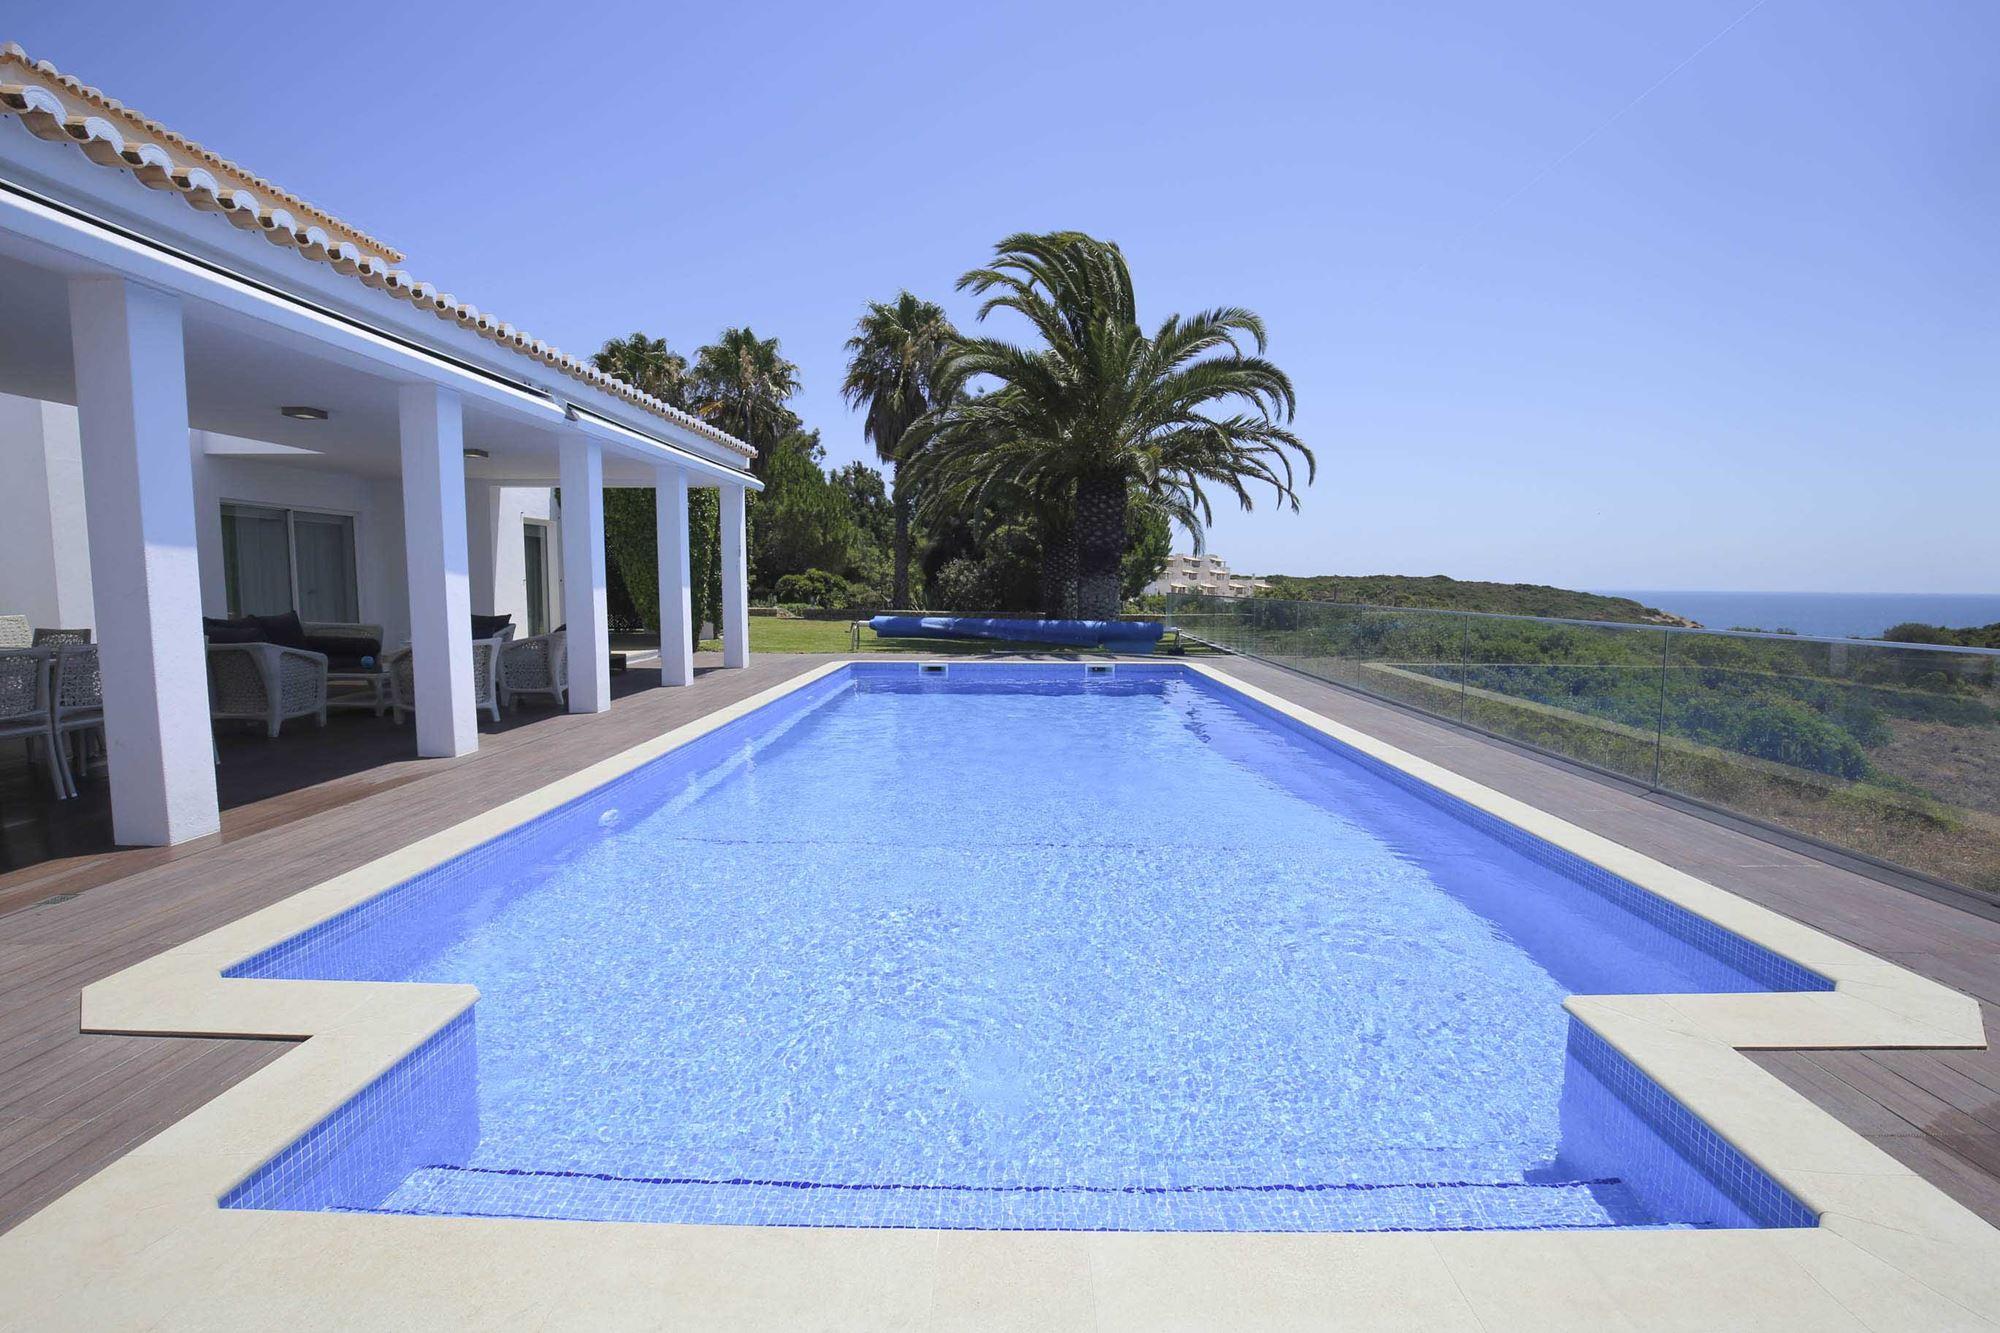 Villa Alice ocean view western Algarve-pool-Enneking Premium Rentals